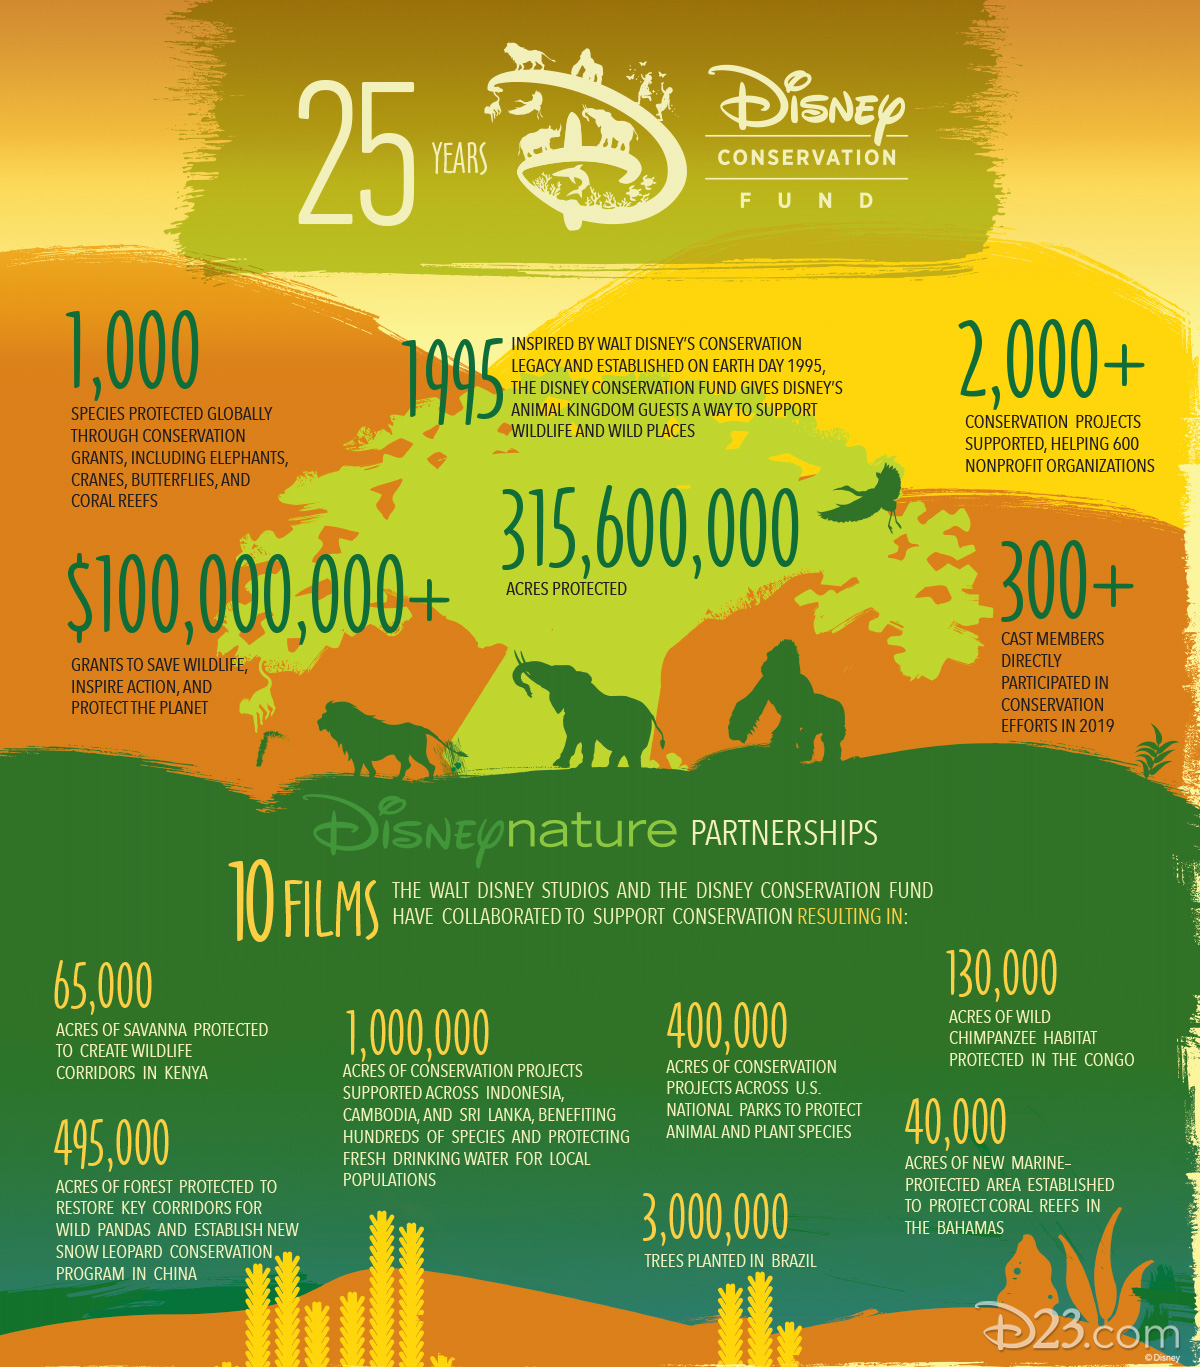 Disney Conservation Fund Infographic